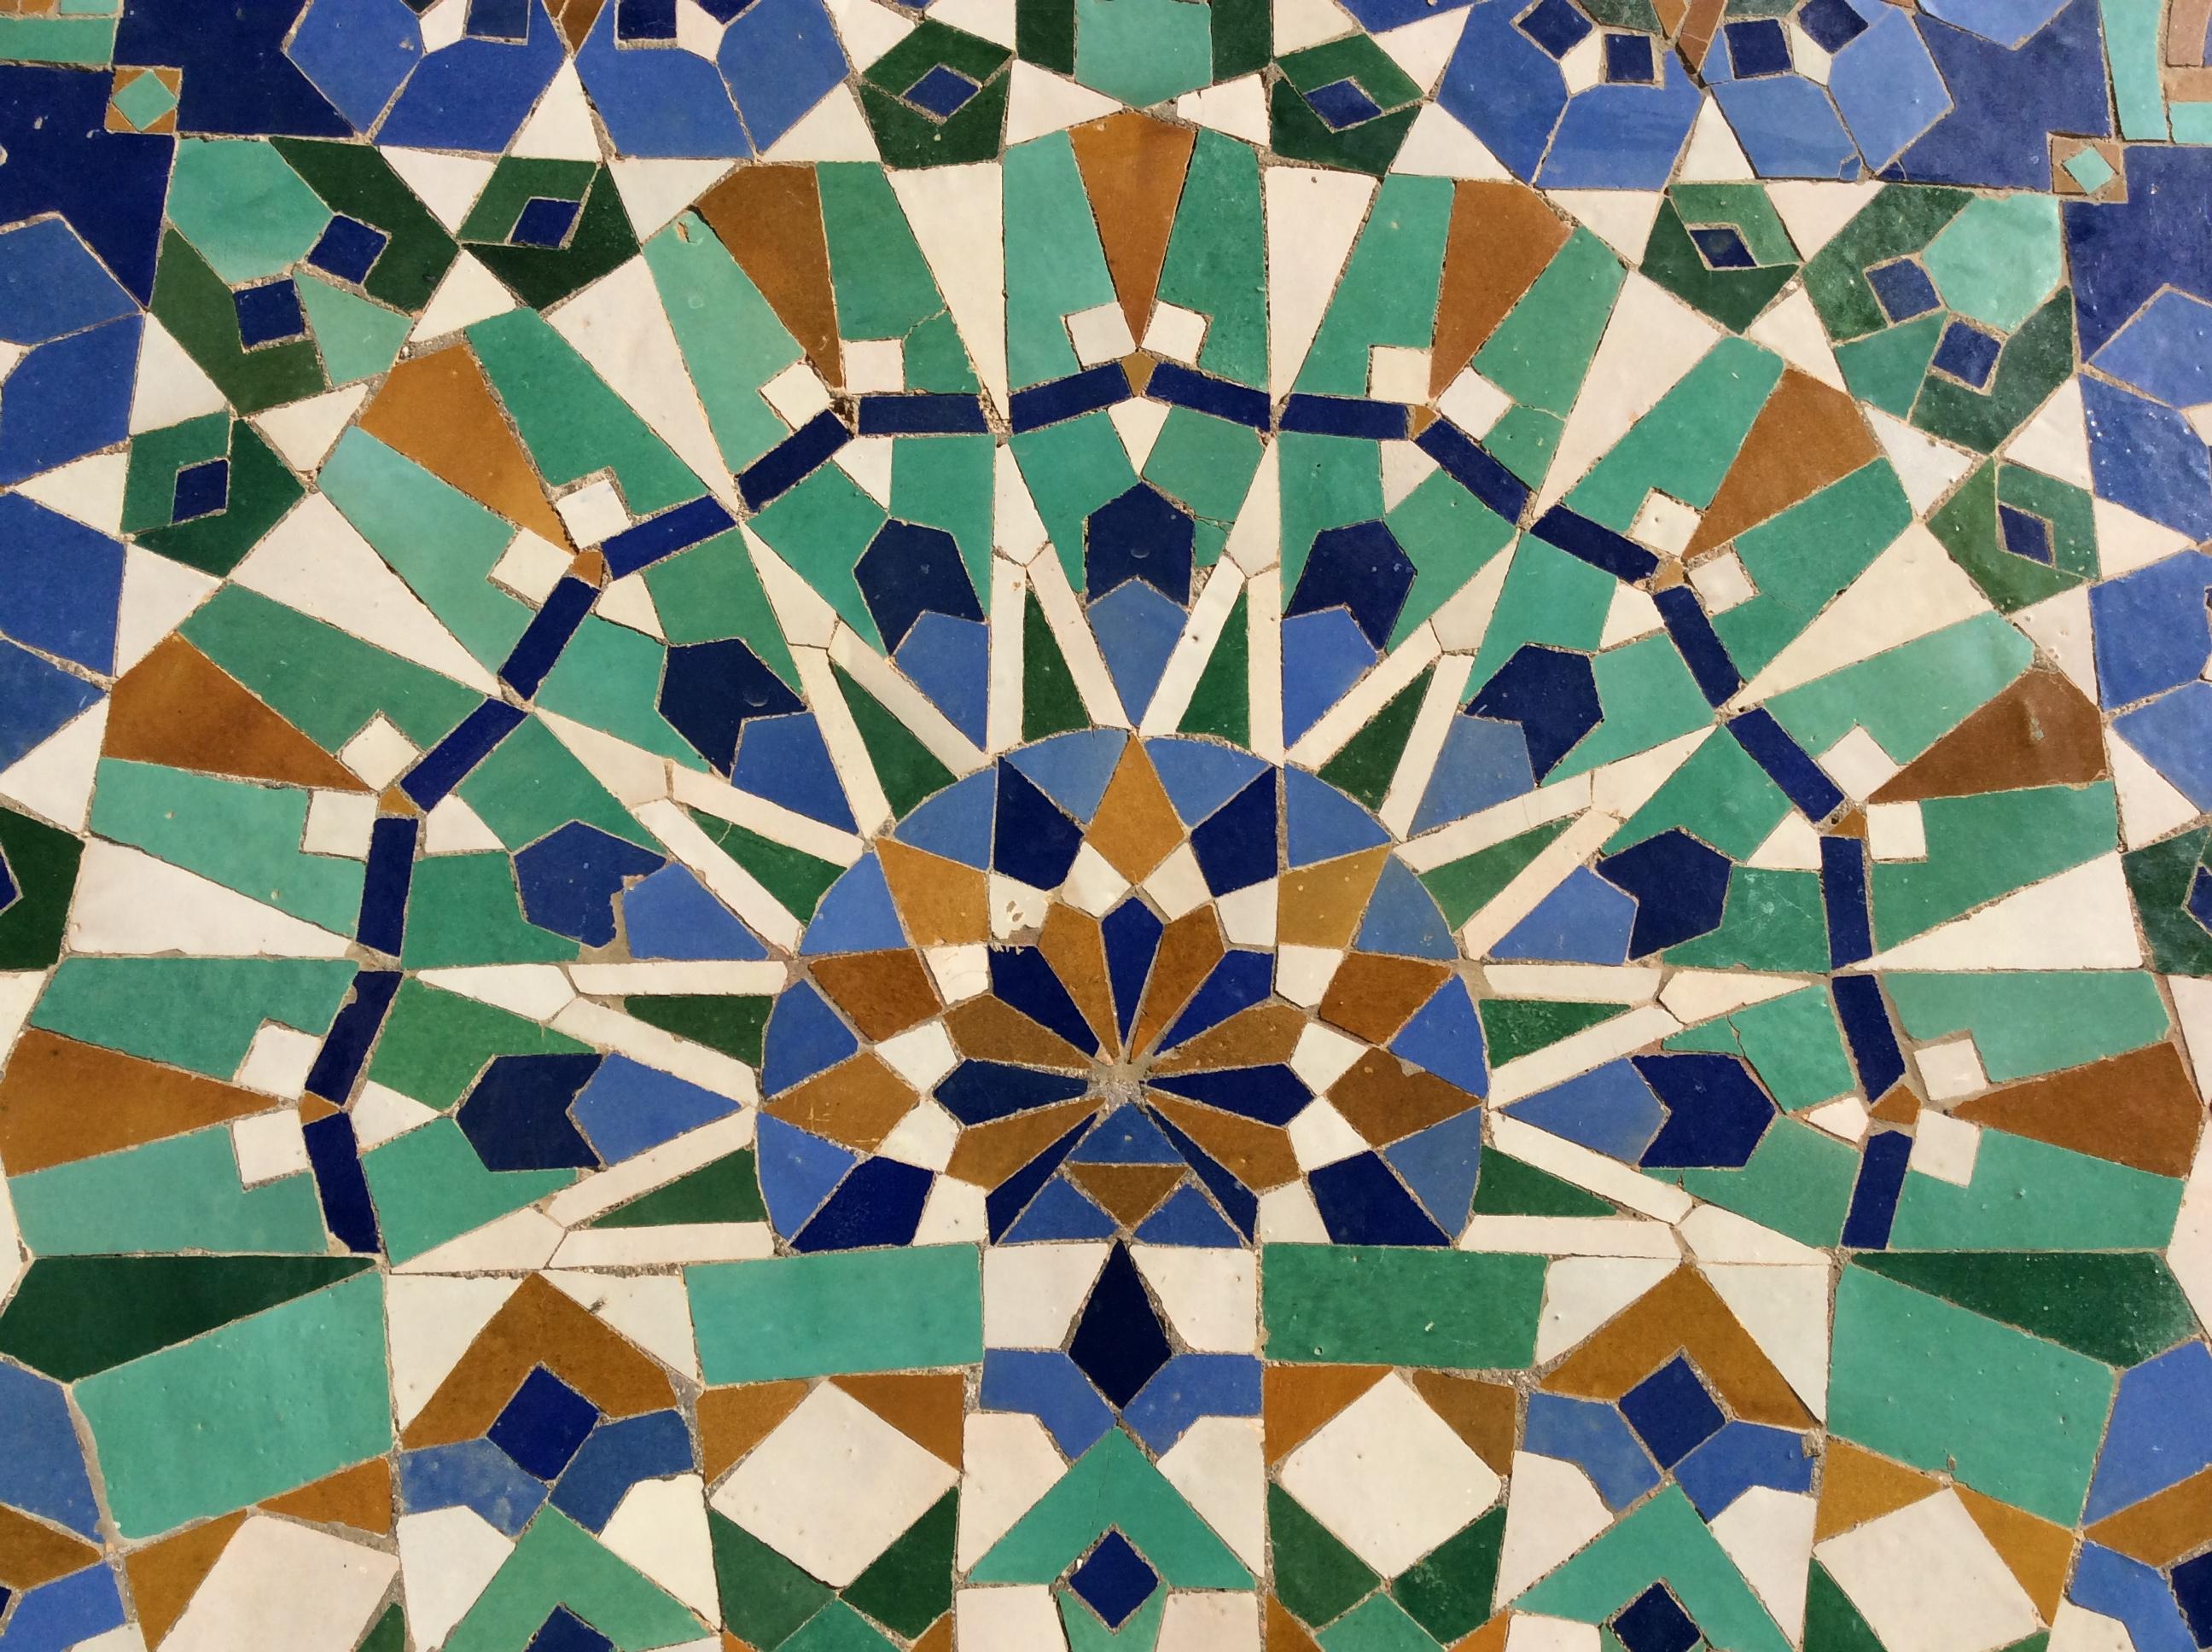 Mosaic_walls__Hassan_II_Mosque__Casablanca__Morocco_.JPG